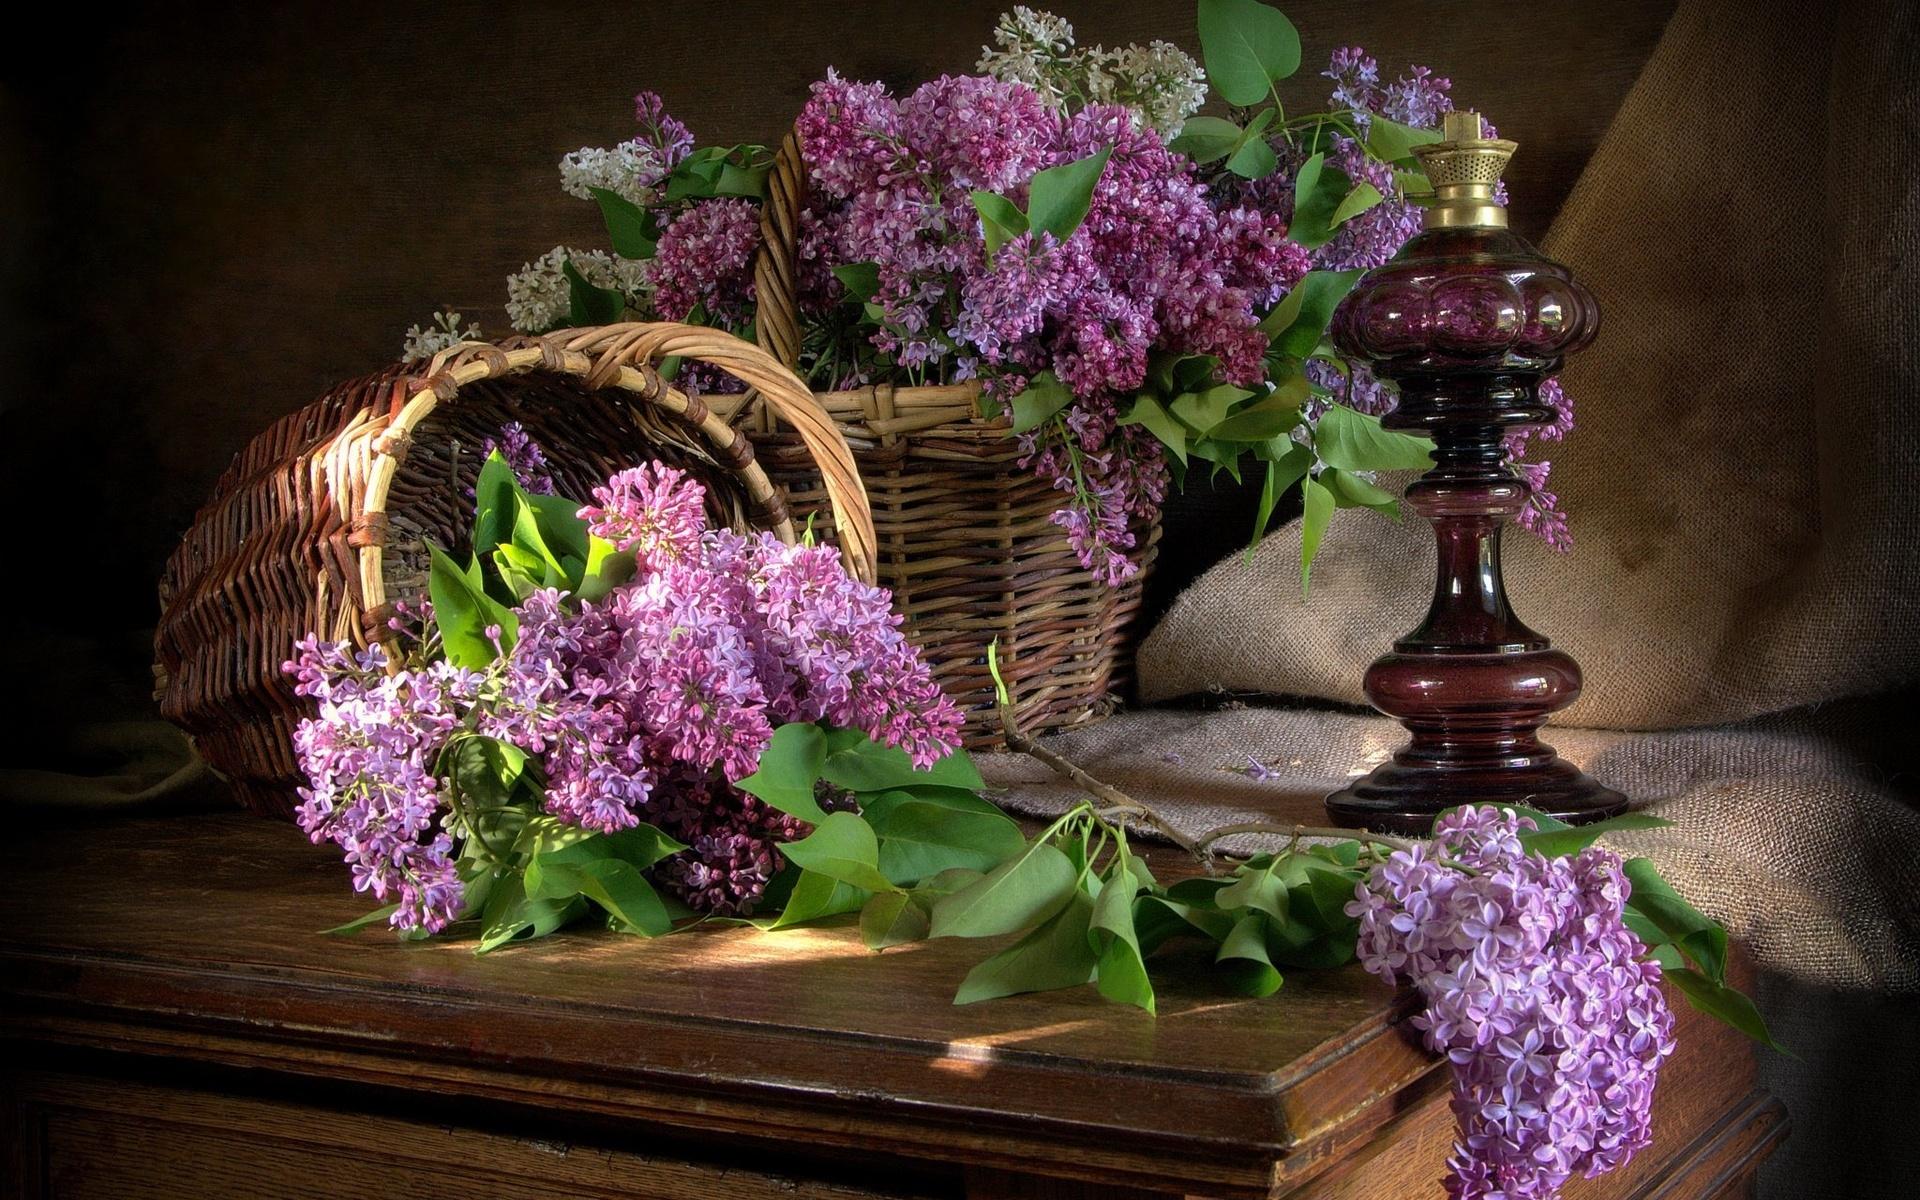 Цветы картинки добрый вечер, картинки